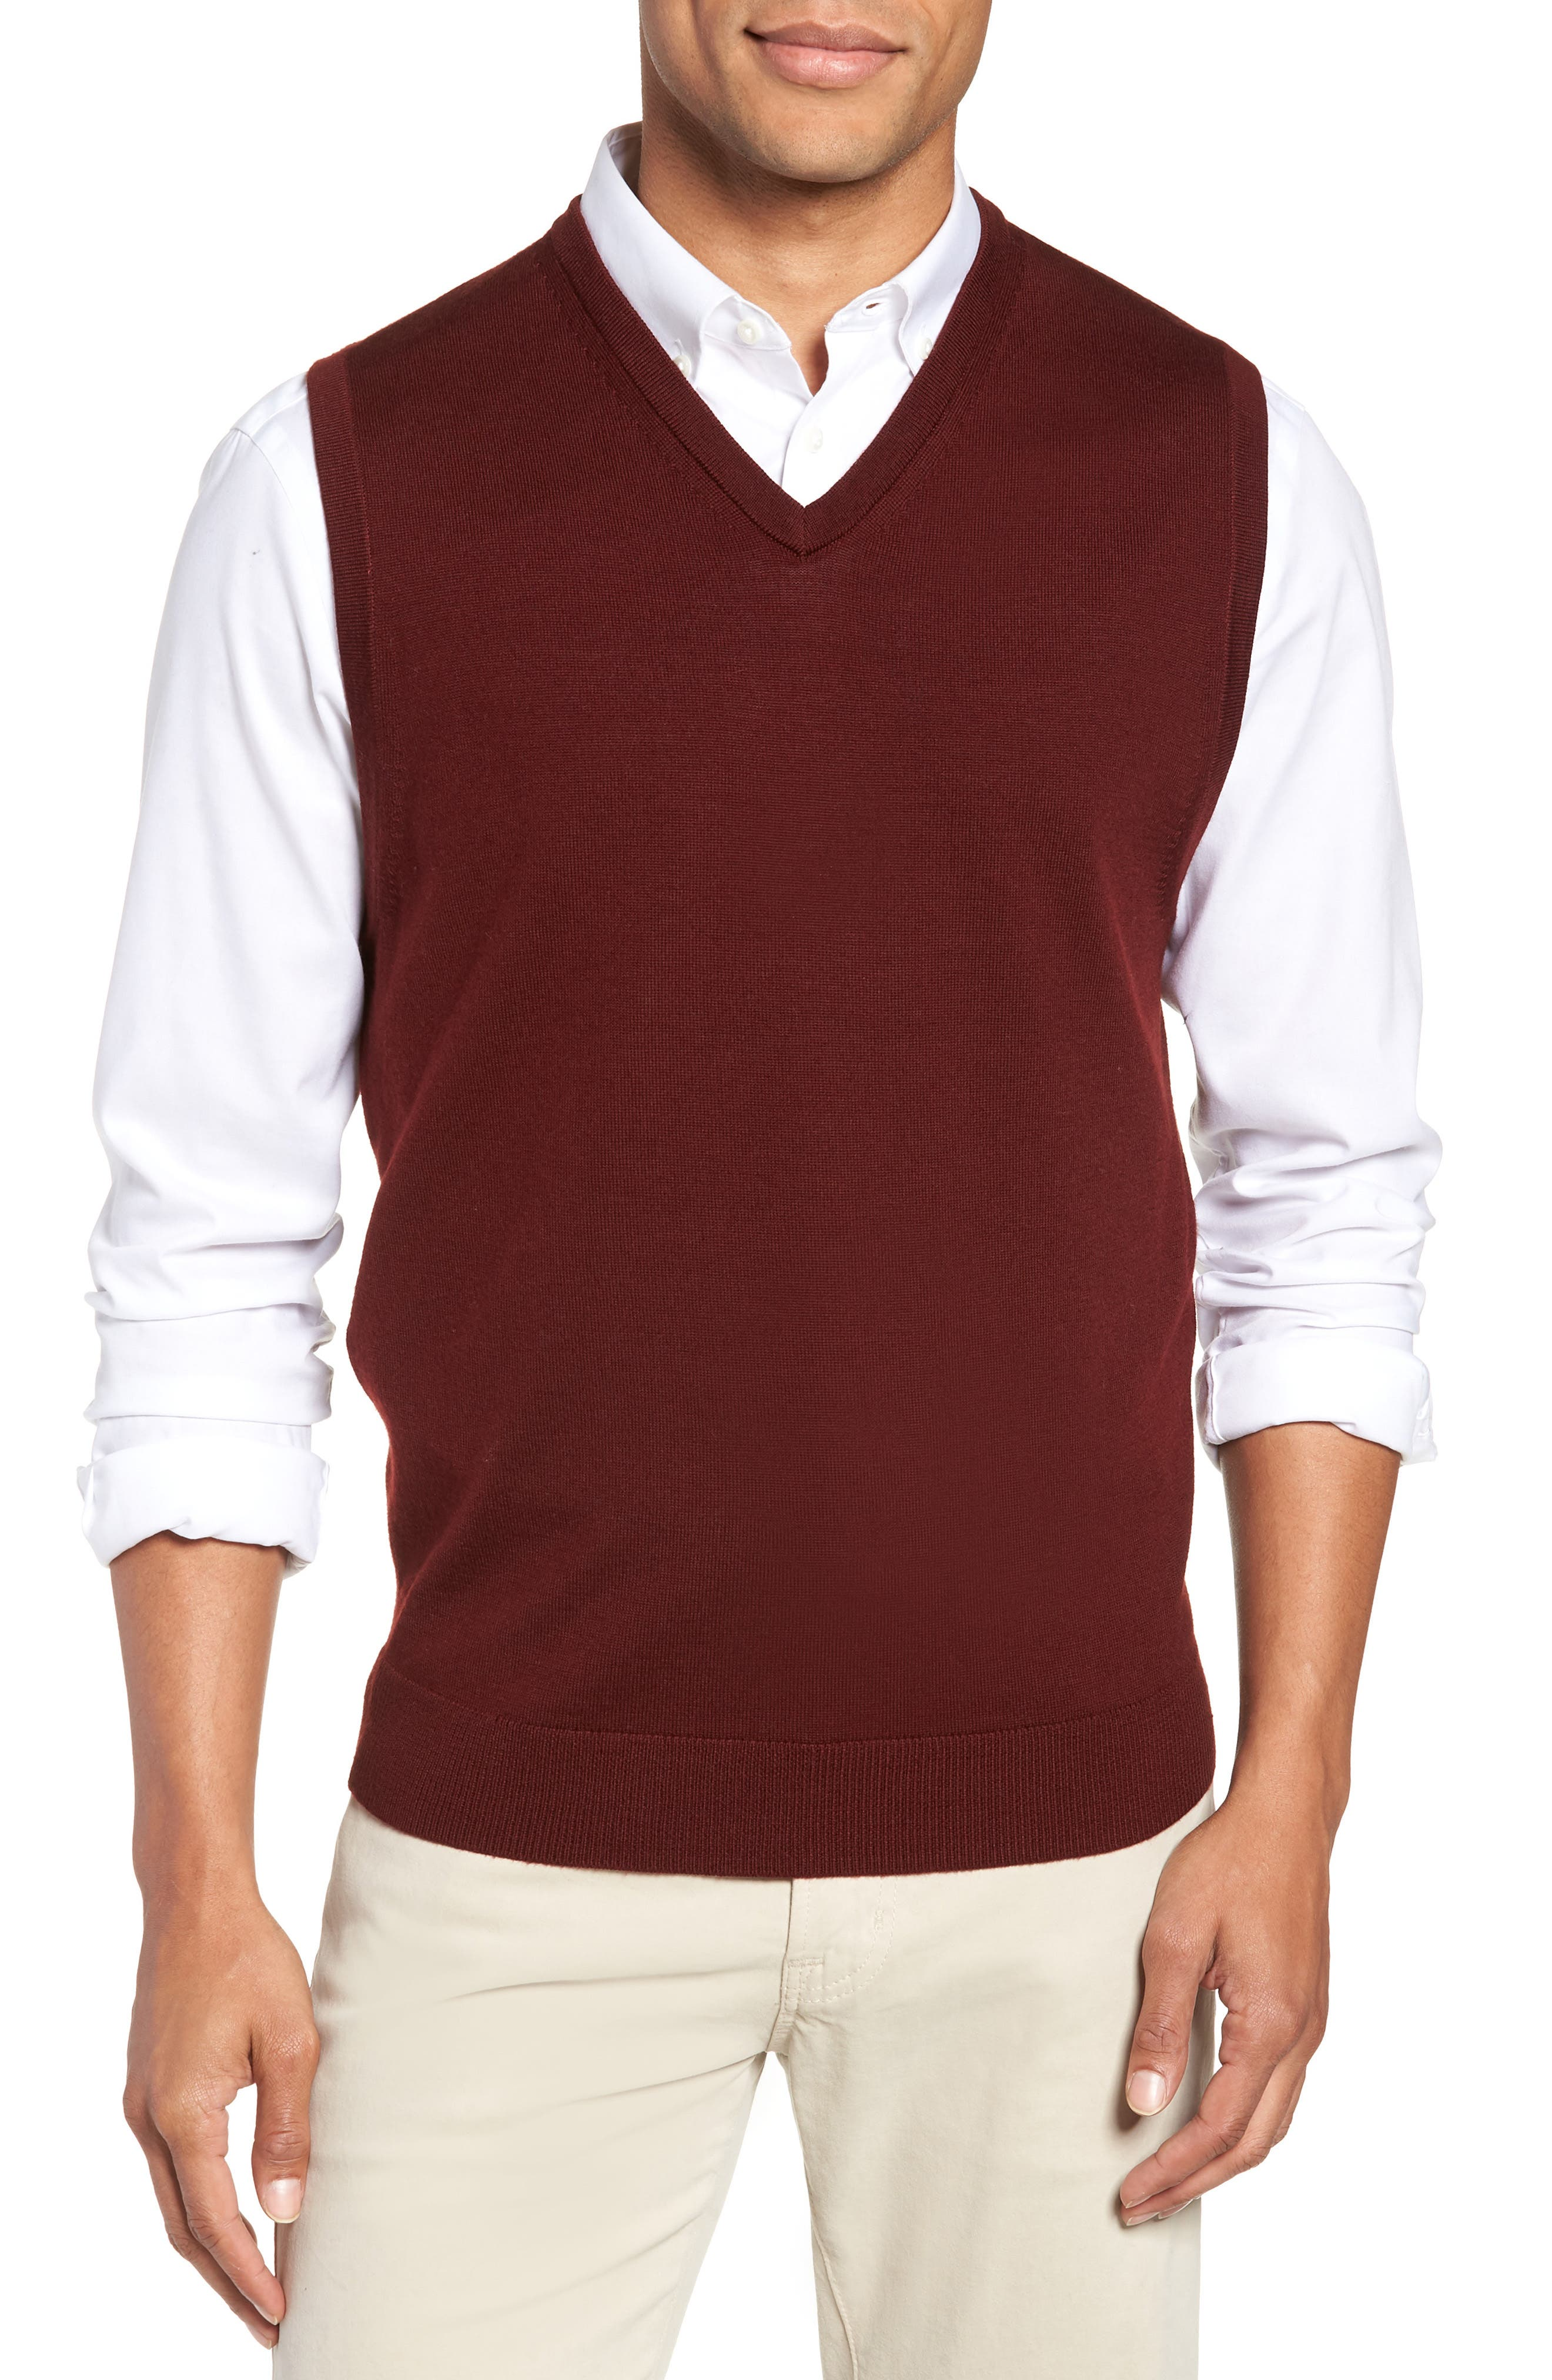 Merino Wool Sweater Vest,                             Main thumbnail 1, color,                             BURGUNDY ROYALE